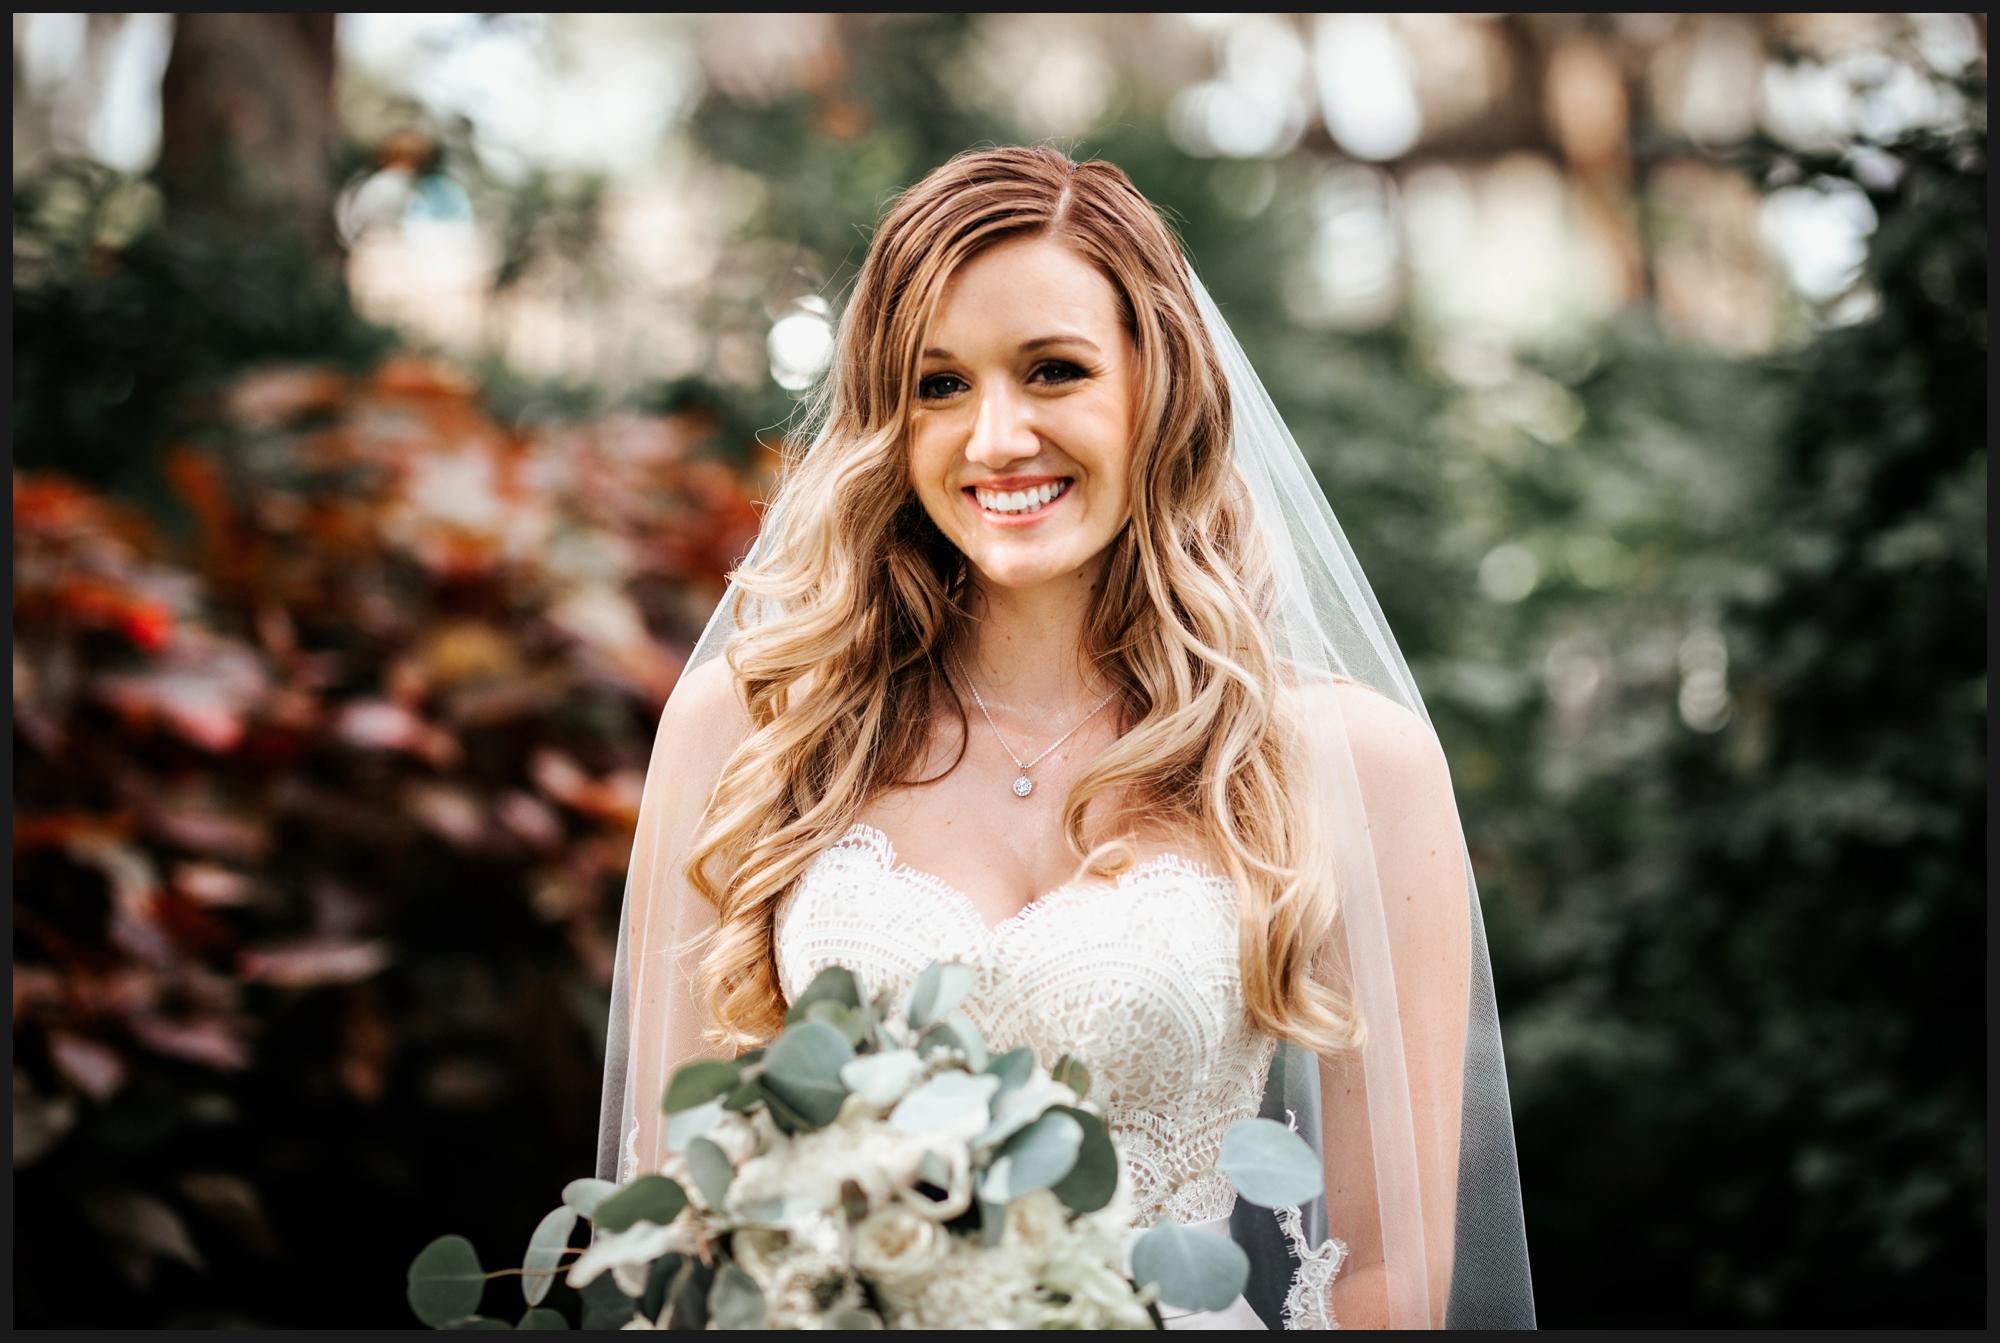 Orlando-Wedding-Photographer-destination-wedding-photographer-florida-wedding-photographer-bohemian-wedding-photographer_0287.jpg